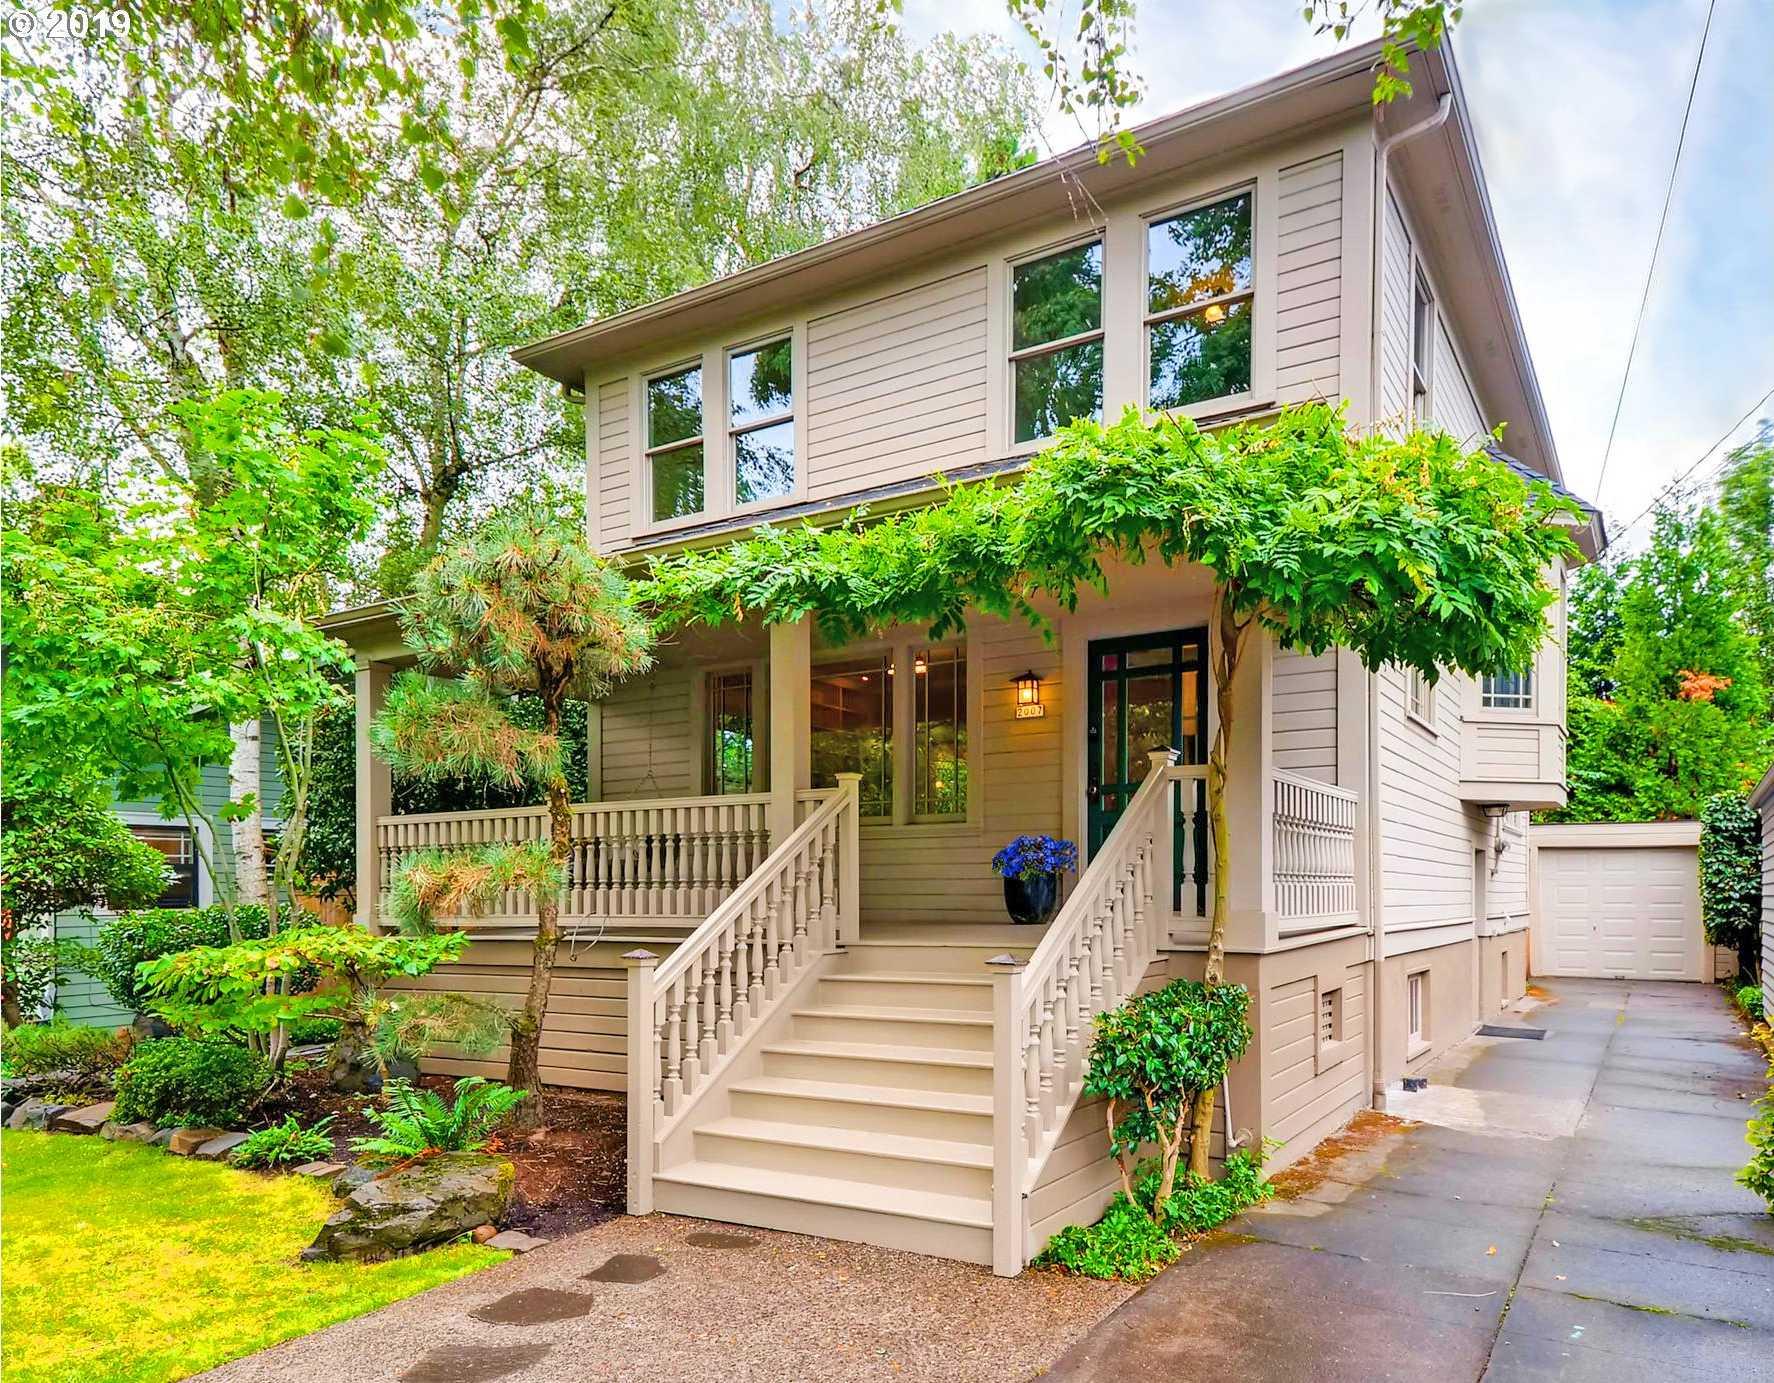 $739,900 - 4Br/3Ba -  for Sale in Irvington, Portland